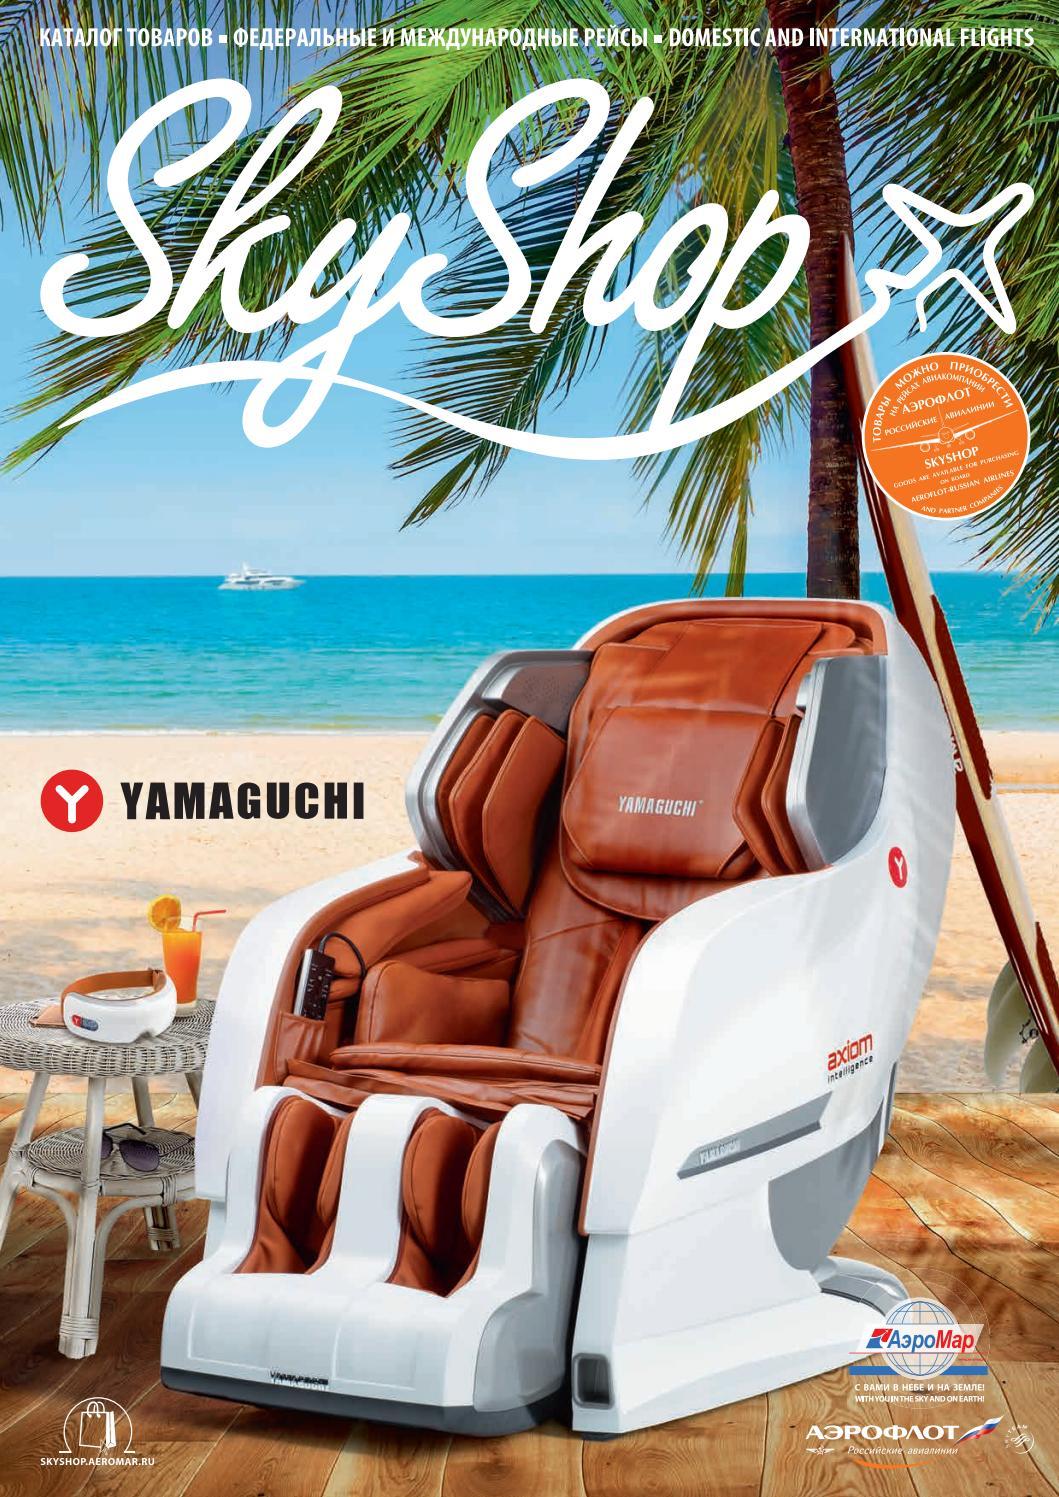 08a89514805c Aeroflot SkyShop. Summer 2016. by Lighthouse Media - issuu